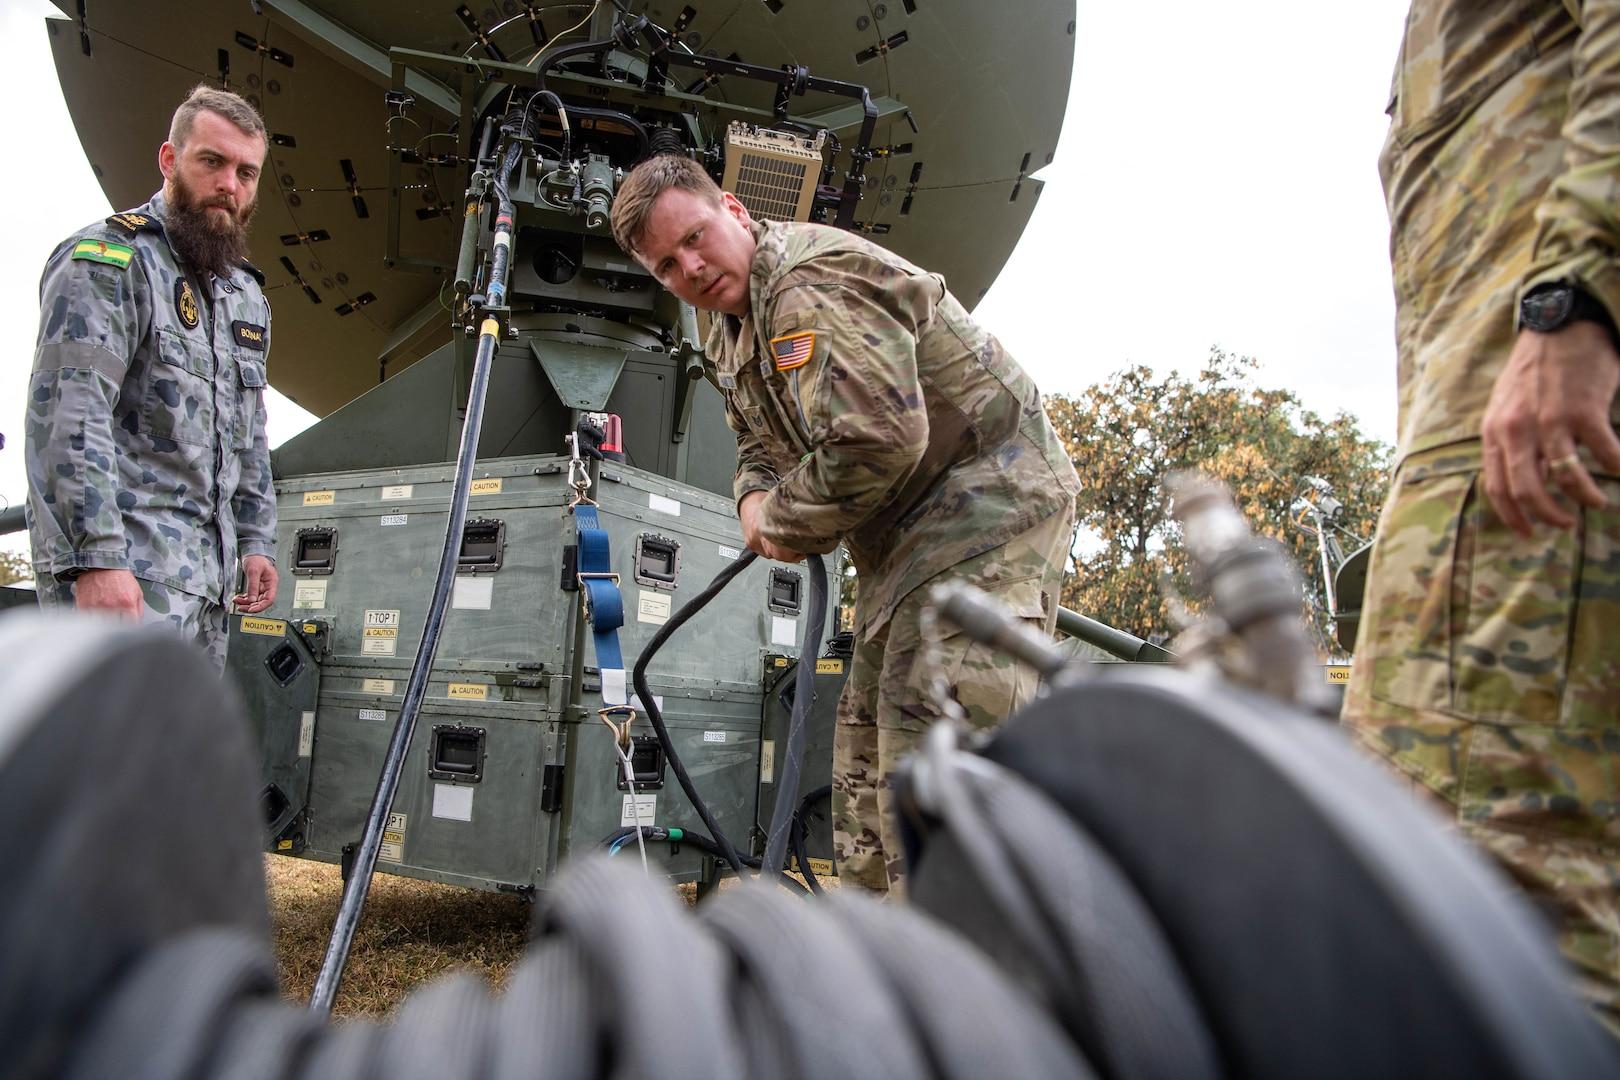 A U.S. service member sets up a communications satellite.